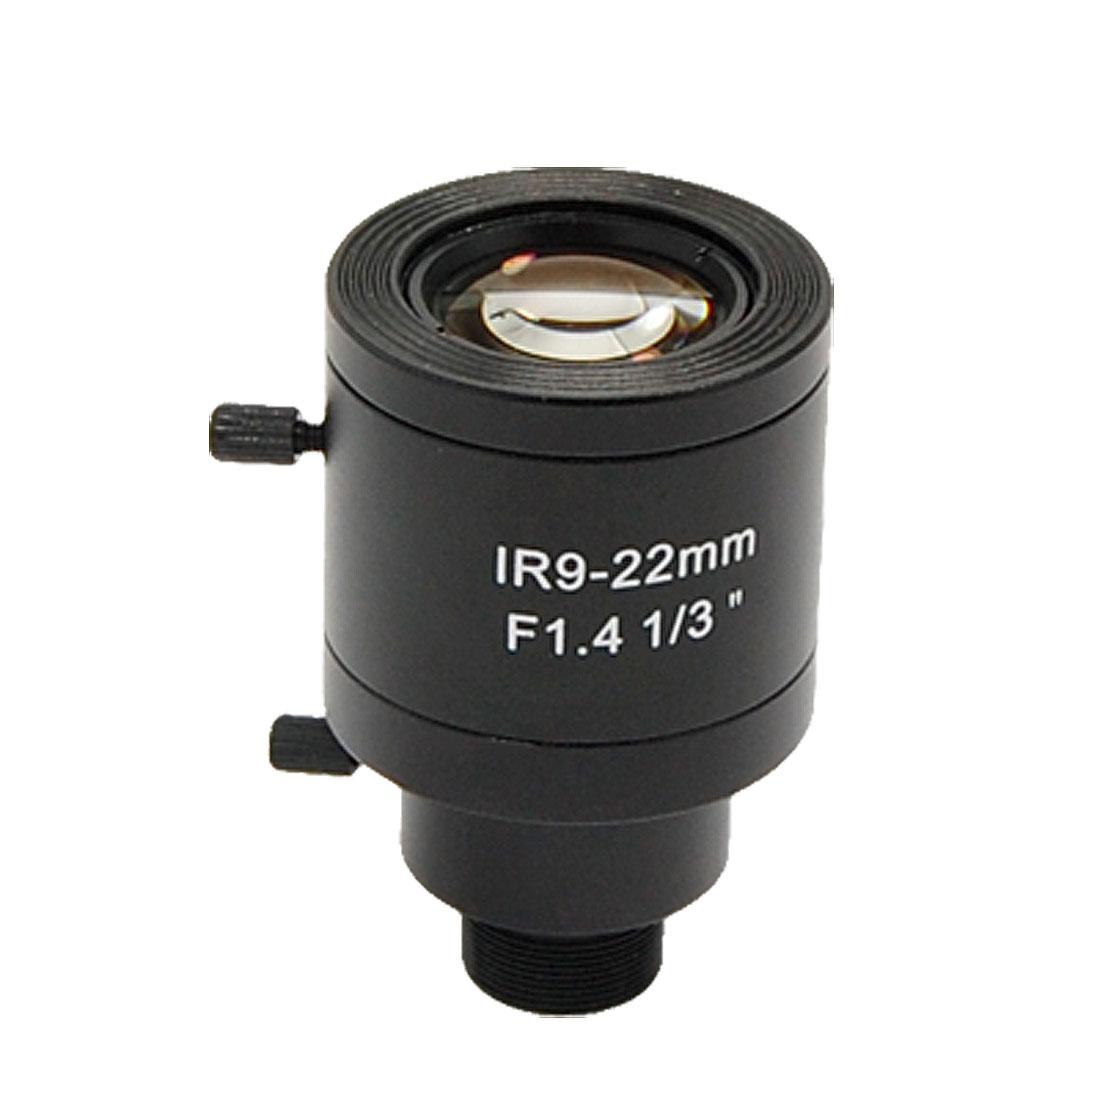 "1/3"" F1.4 Manual CCTV Security Camera Lens 9-22mm"